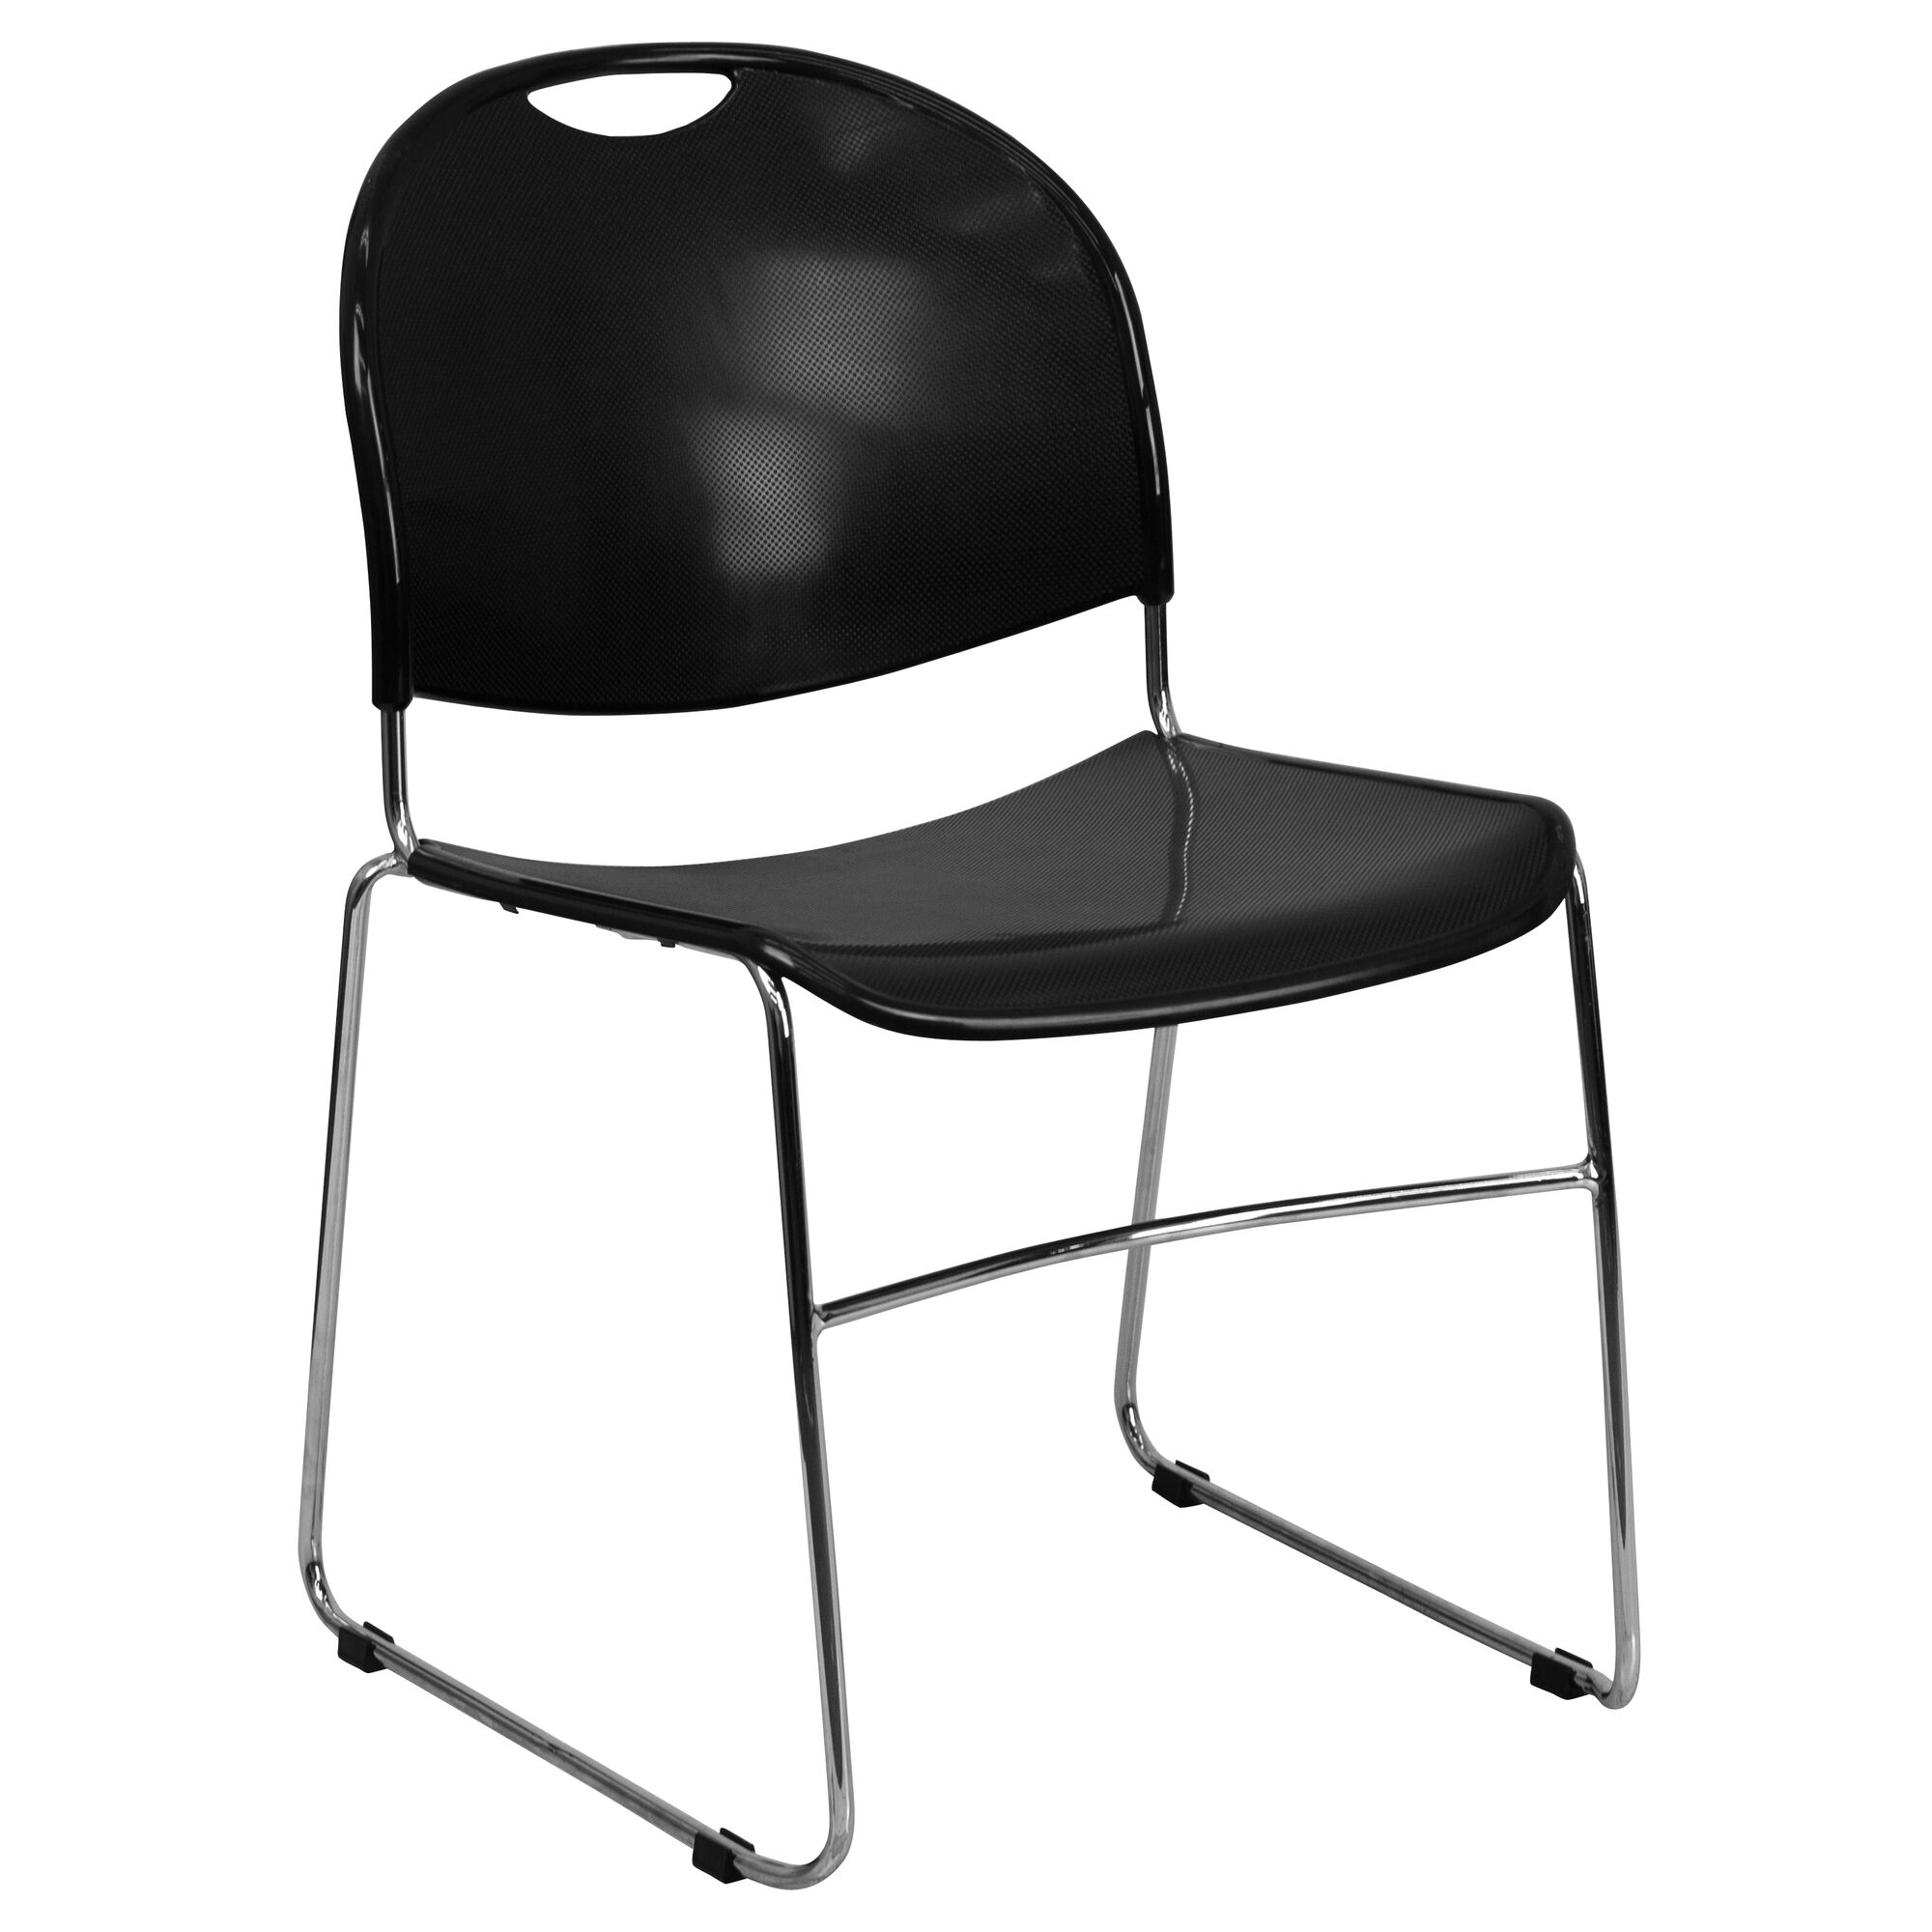 black stack chair chrome frame rut 188 bk chr gg. Black Bedroom Furniture Sets. Home Design Ideas